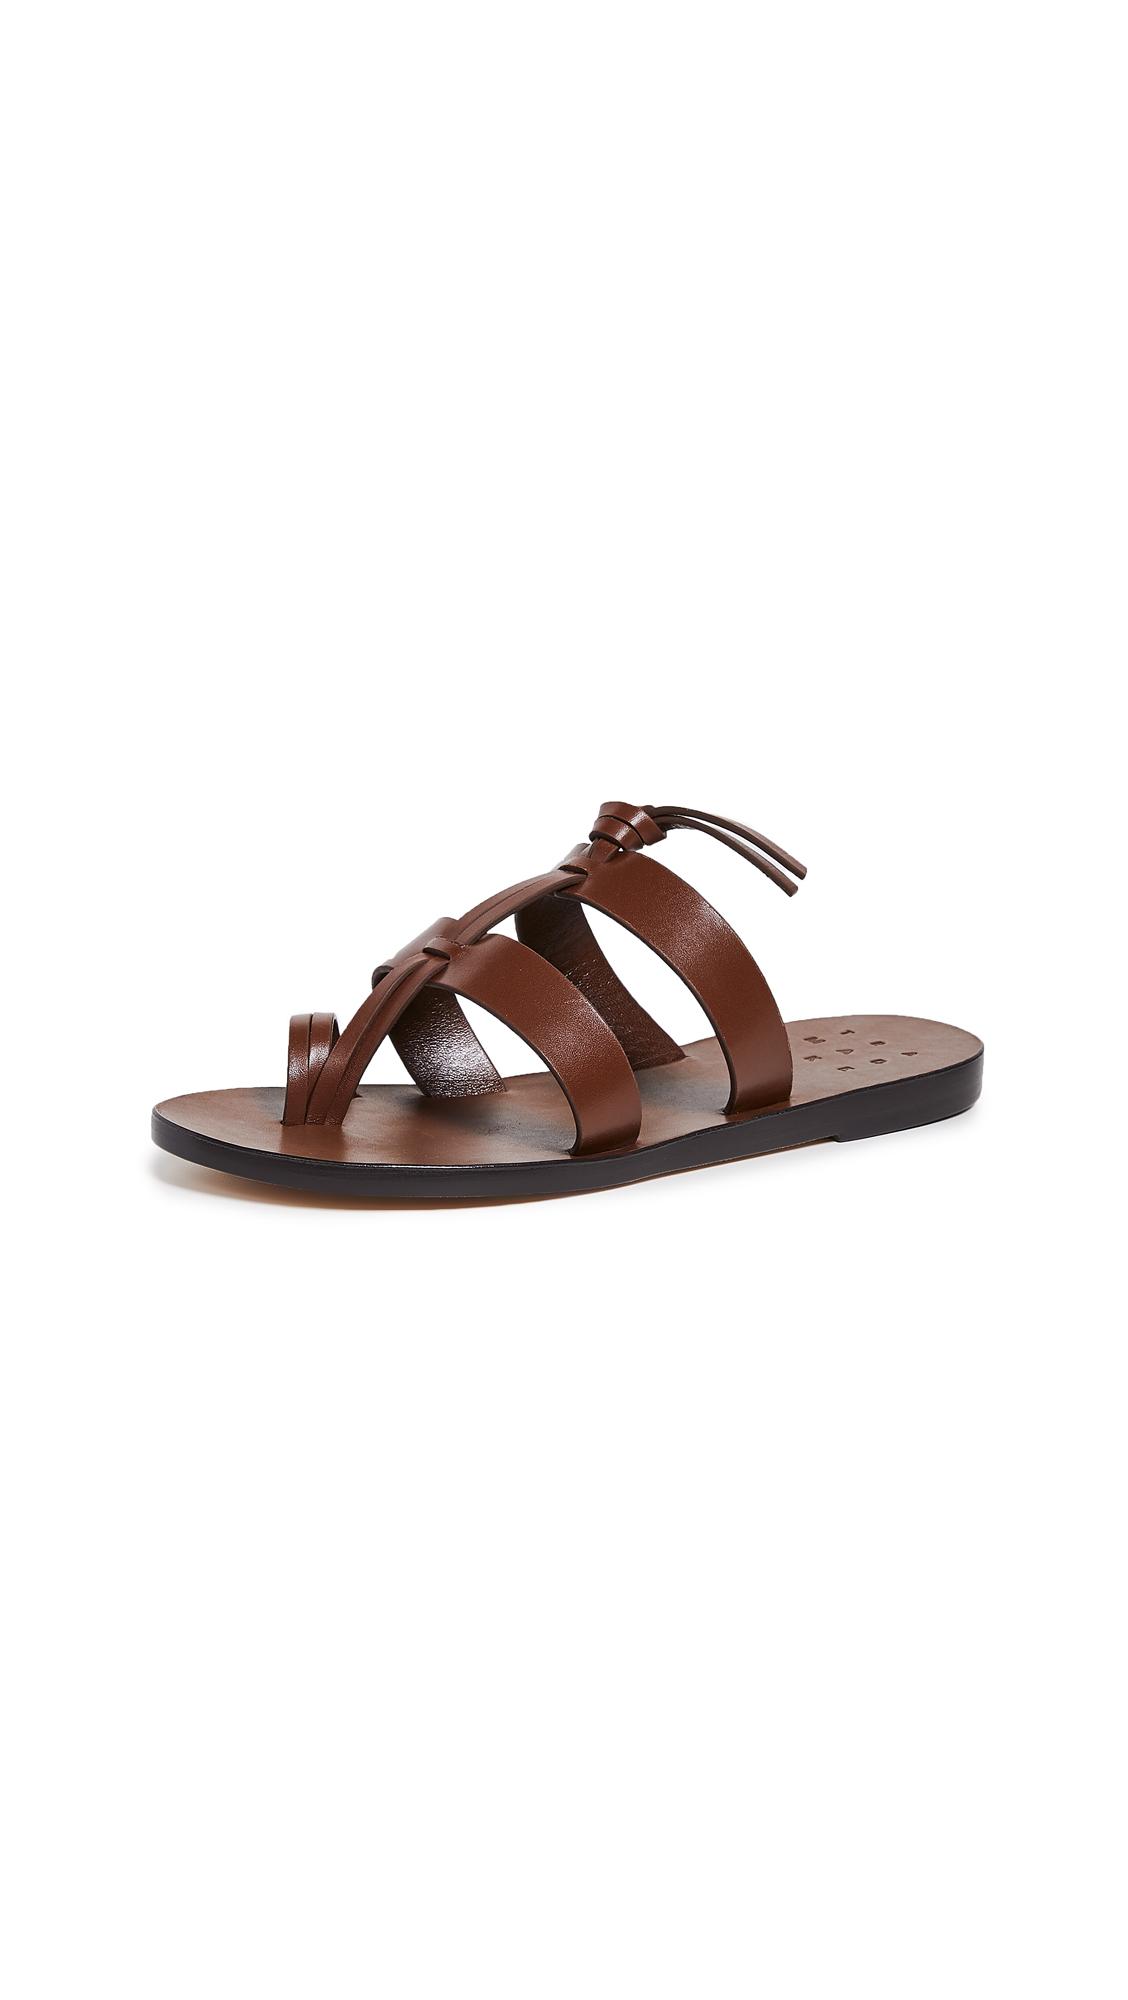 Trademark Capra Toe Ring Sandals - Saddle